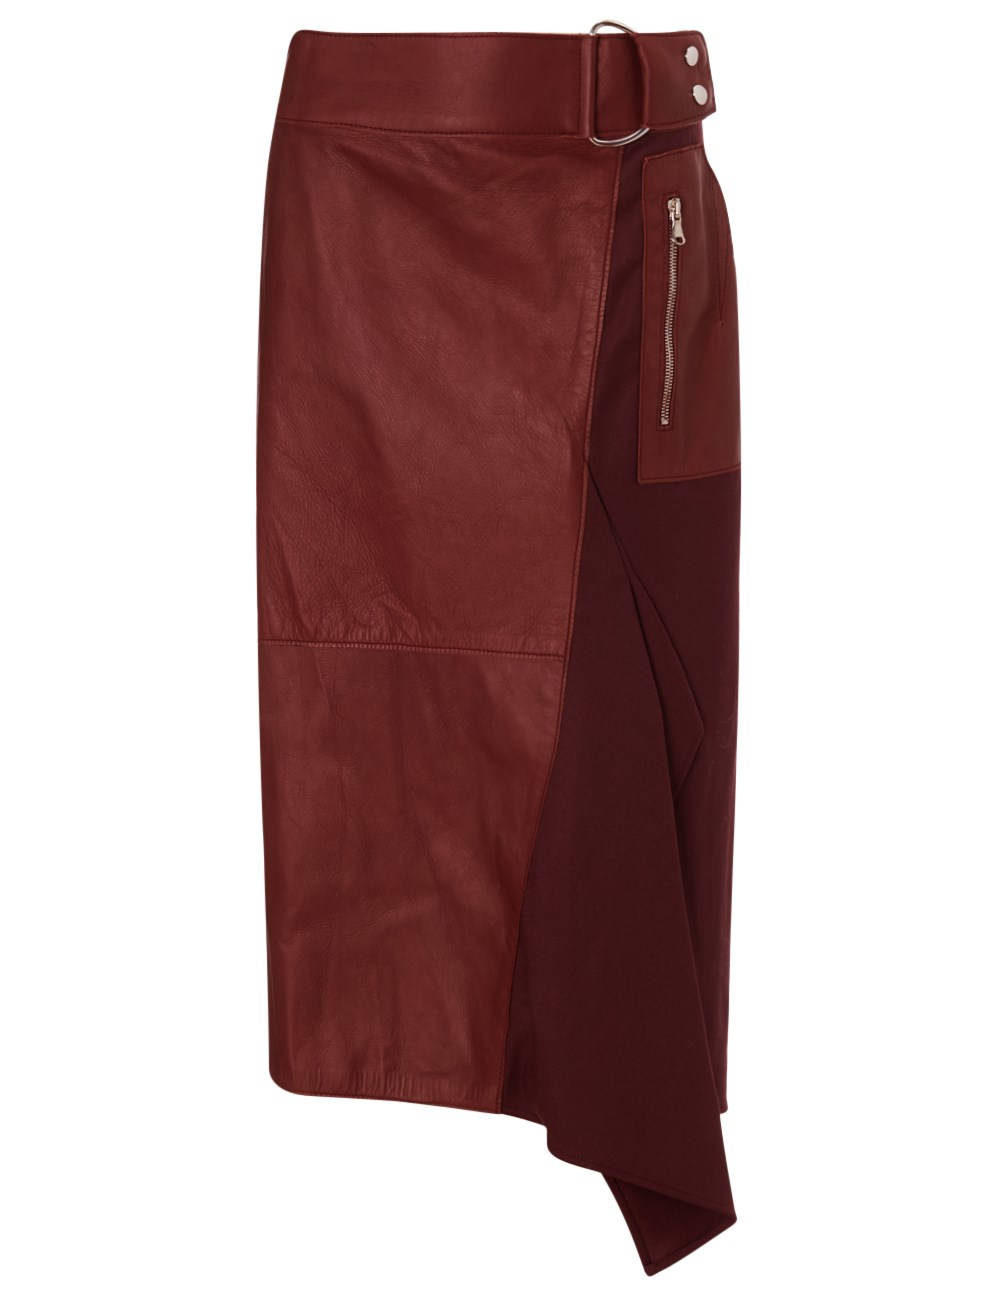 3 1 phillip lim burgundy leather flight details skirt in